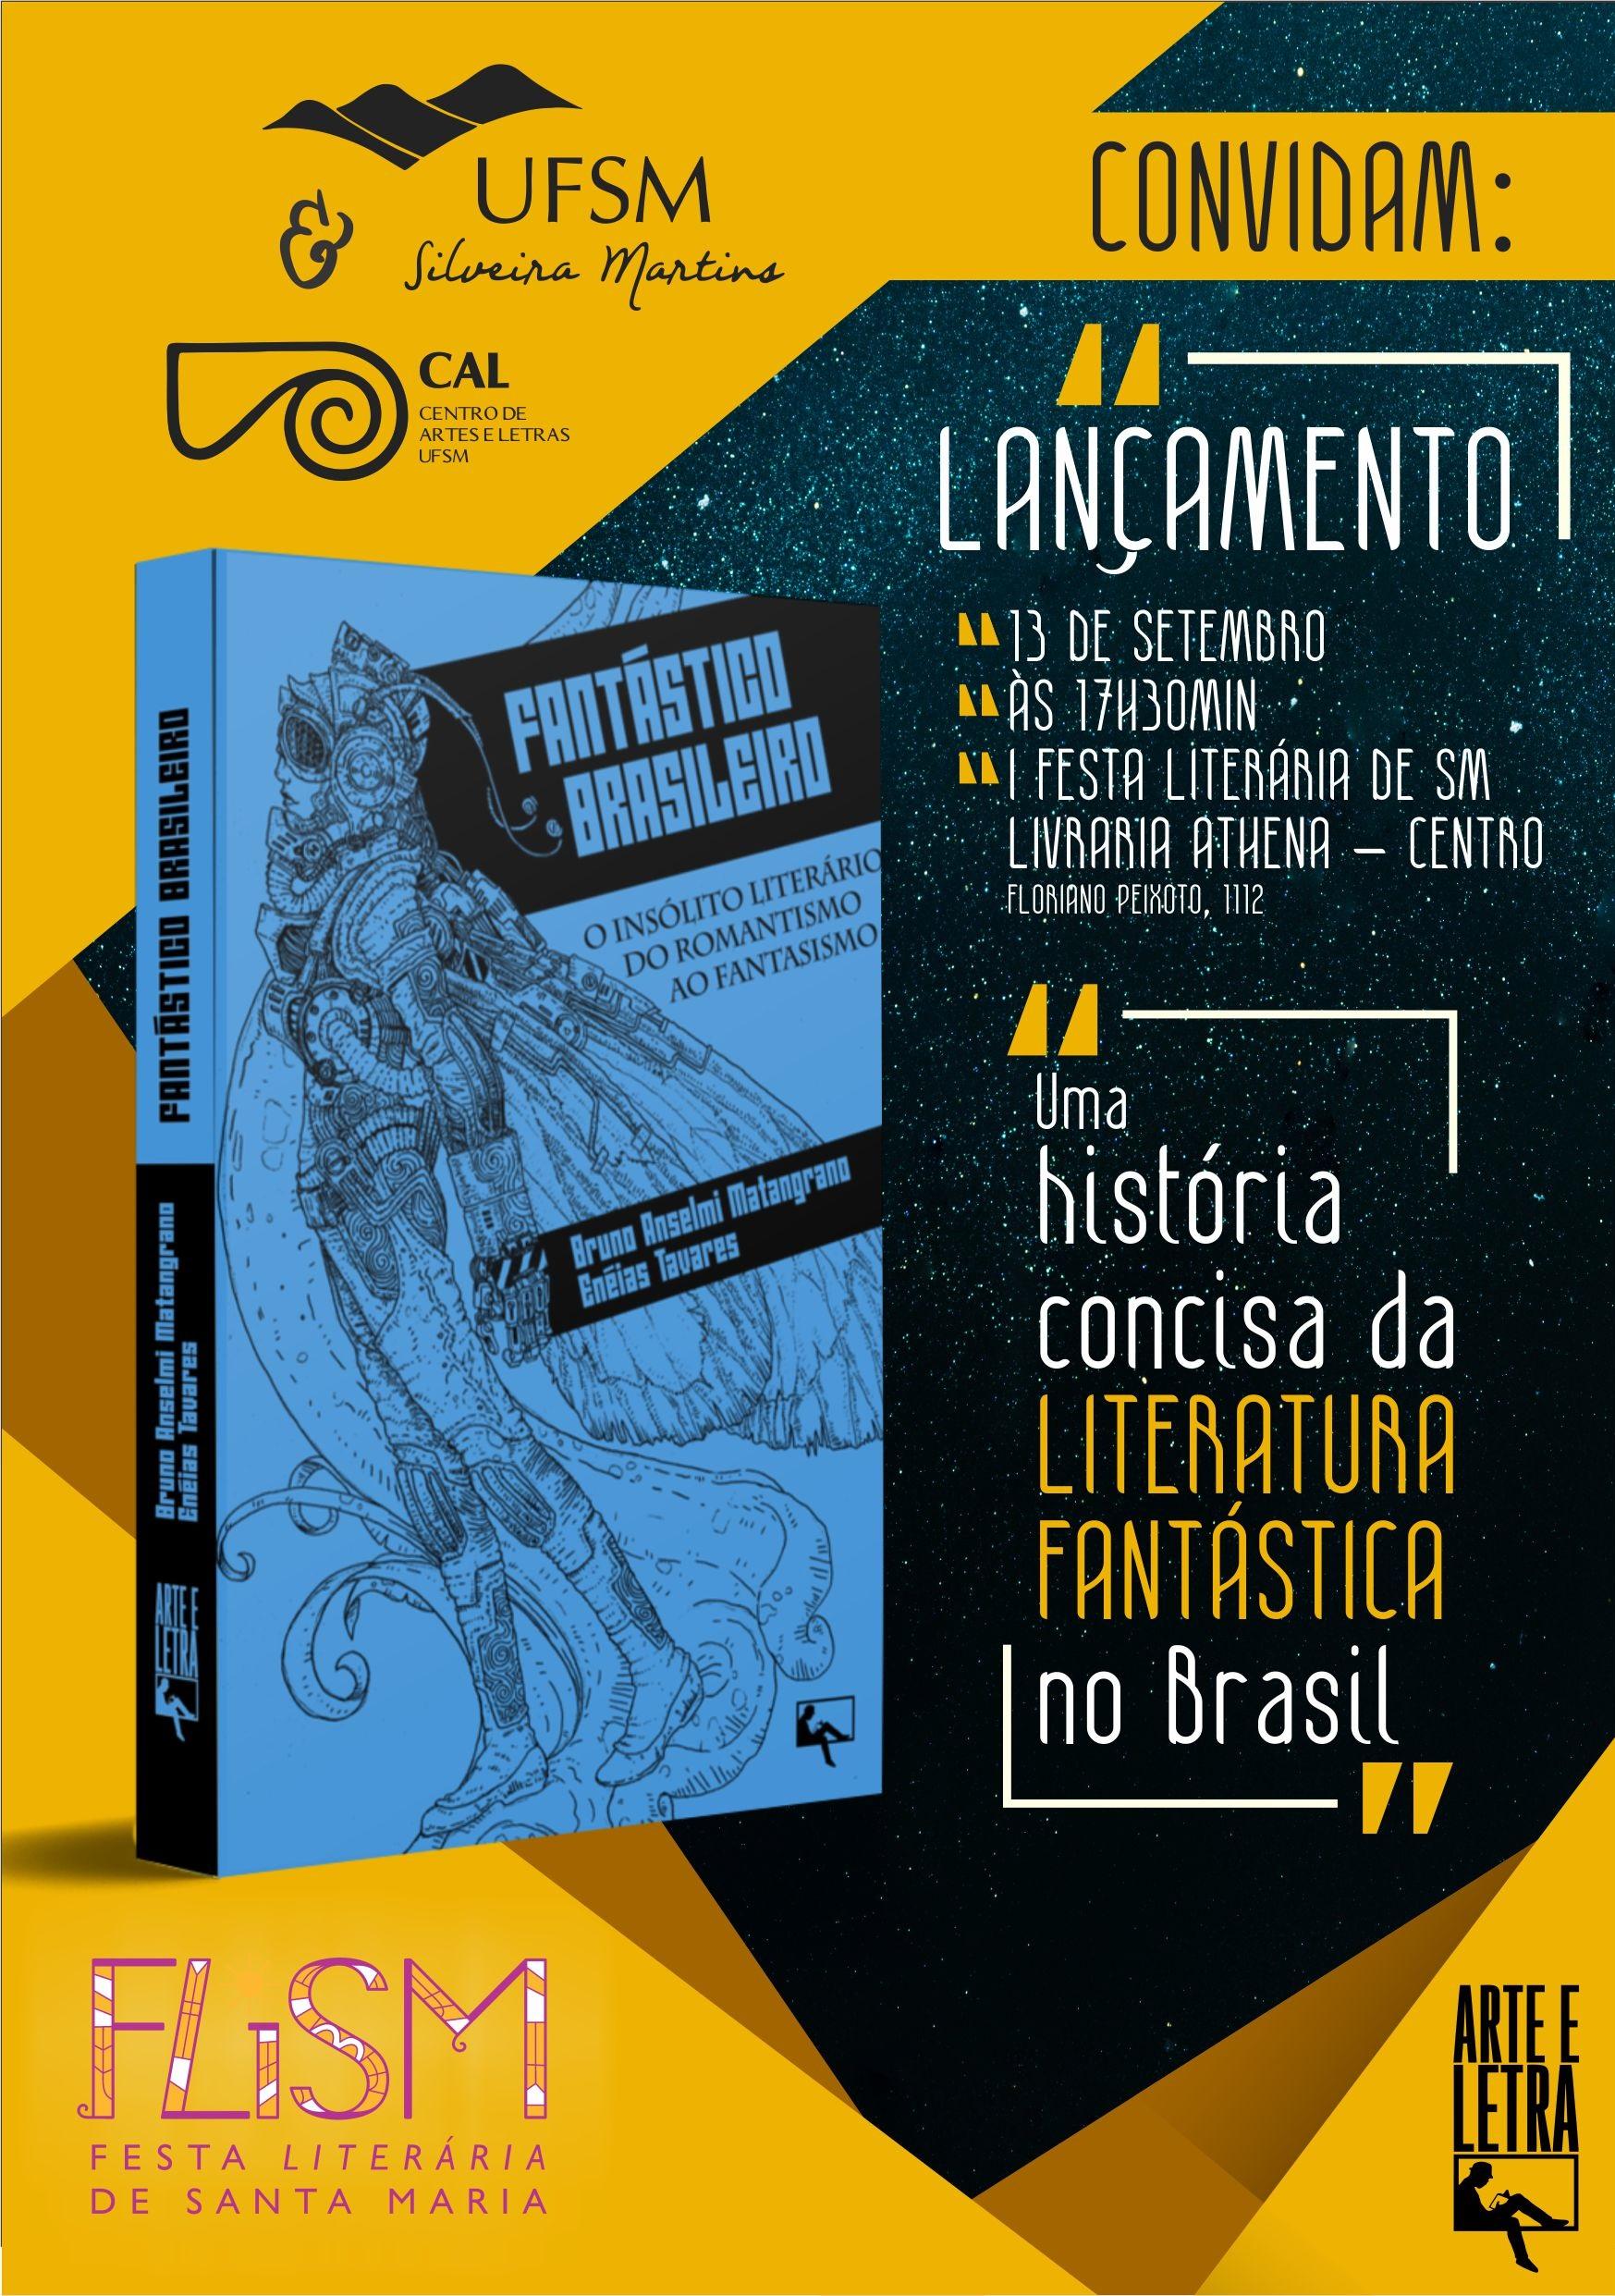 Lançamento Fantástico Brasileiro